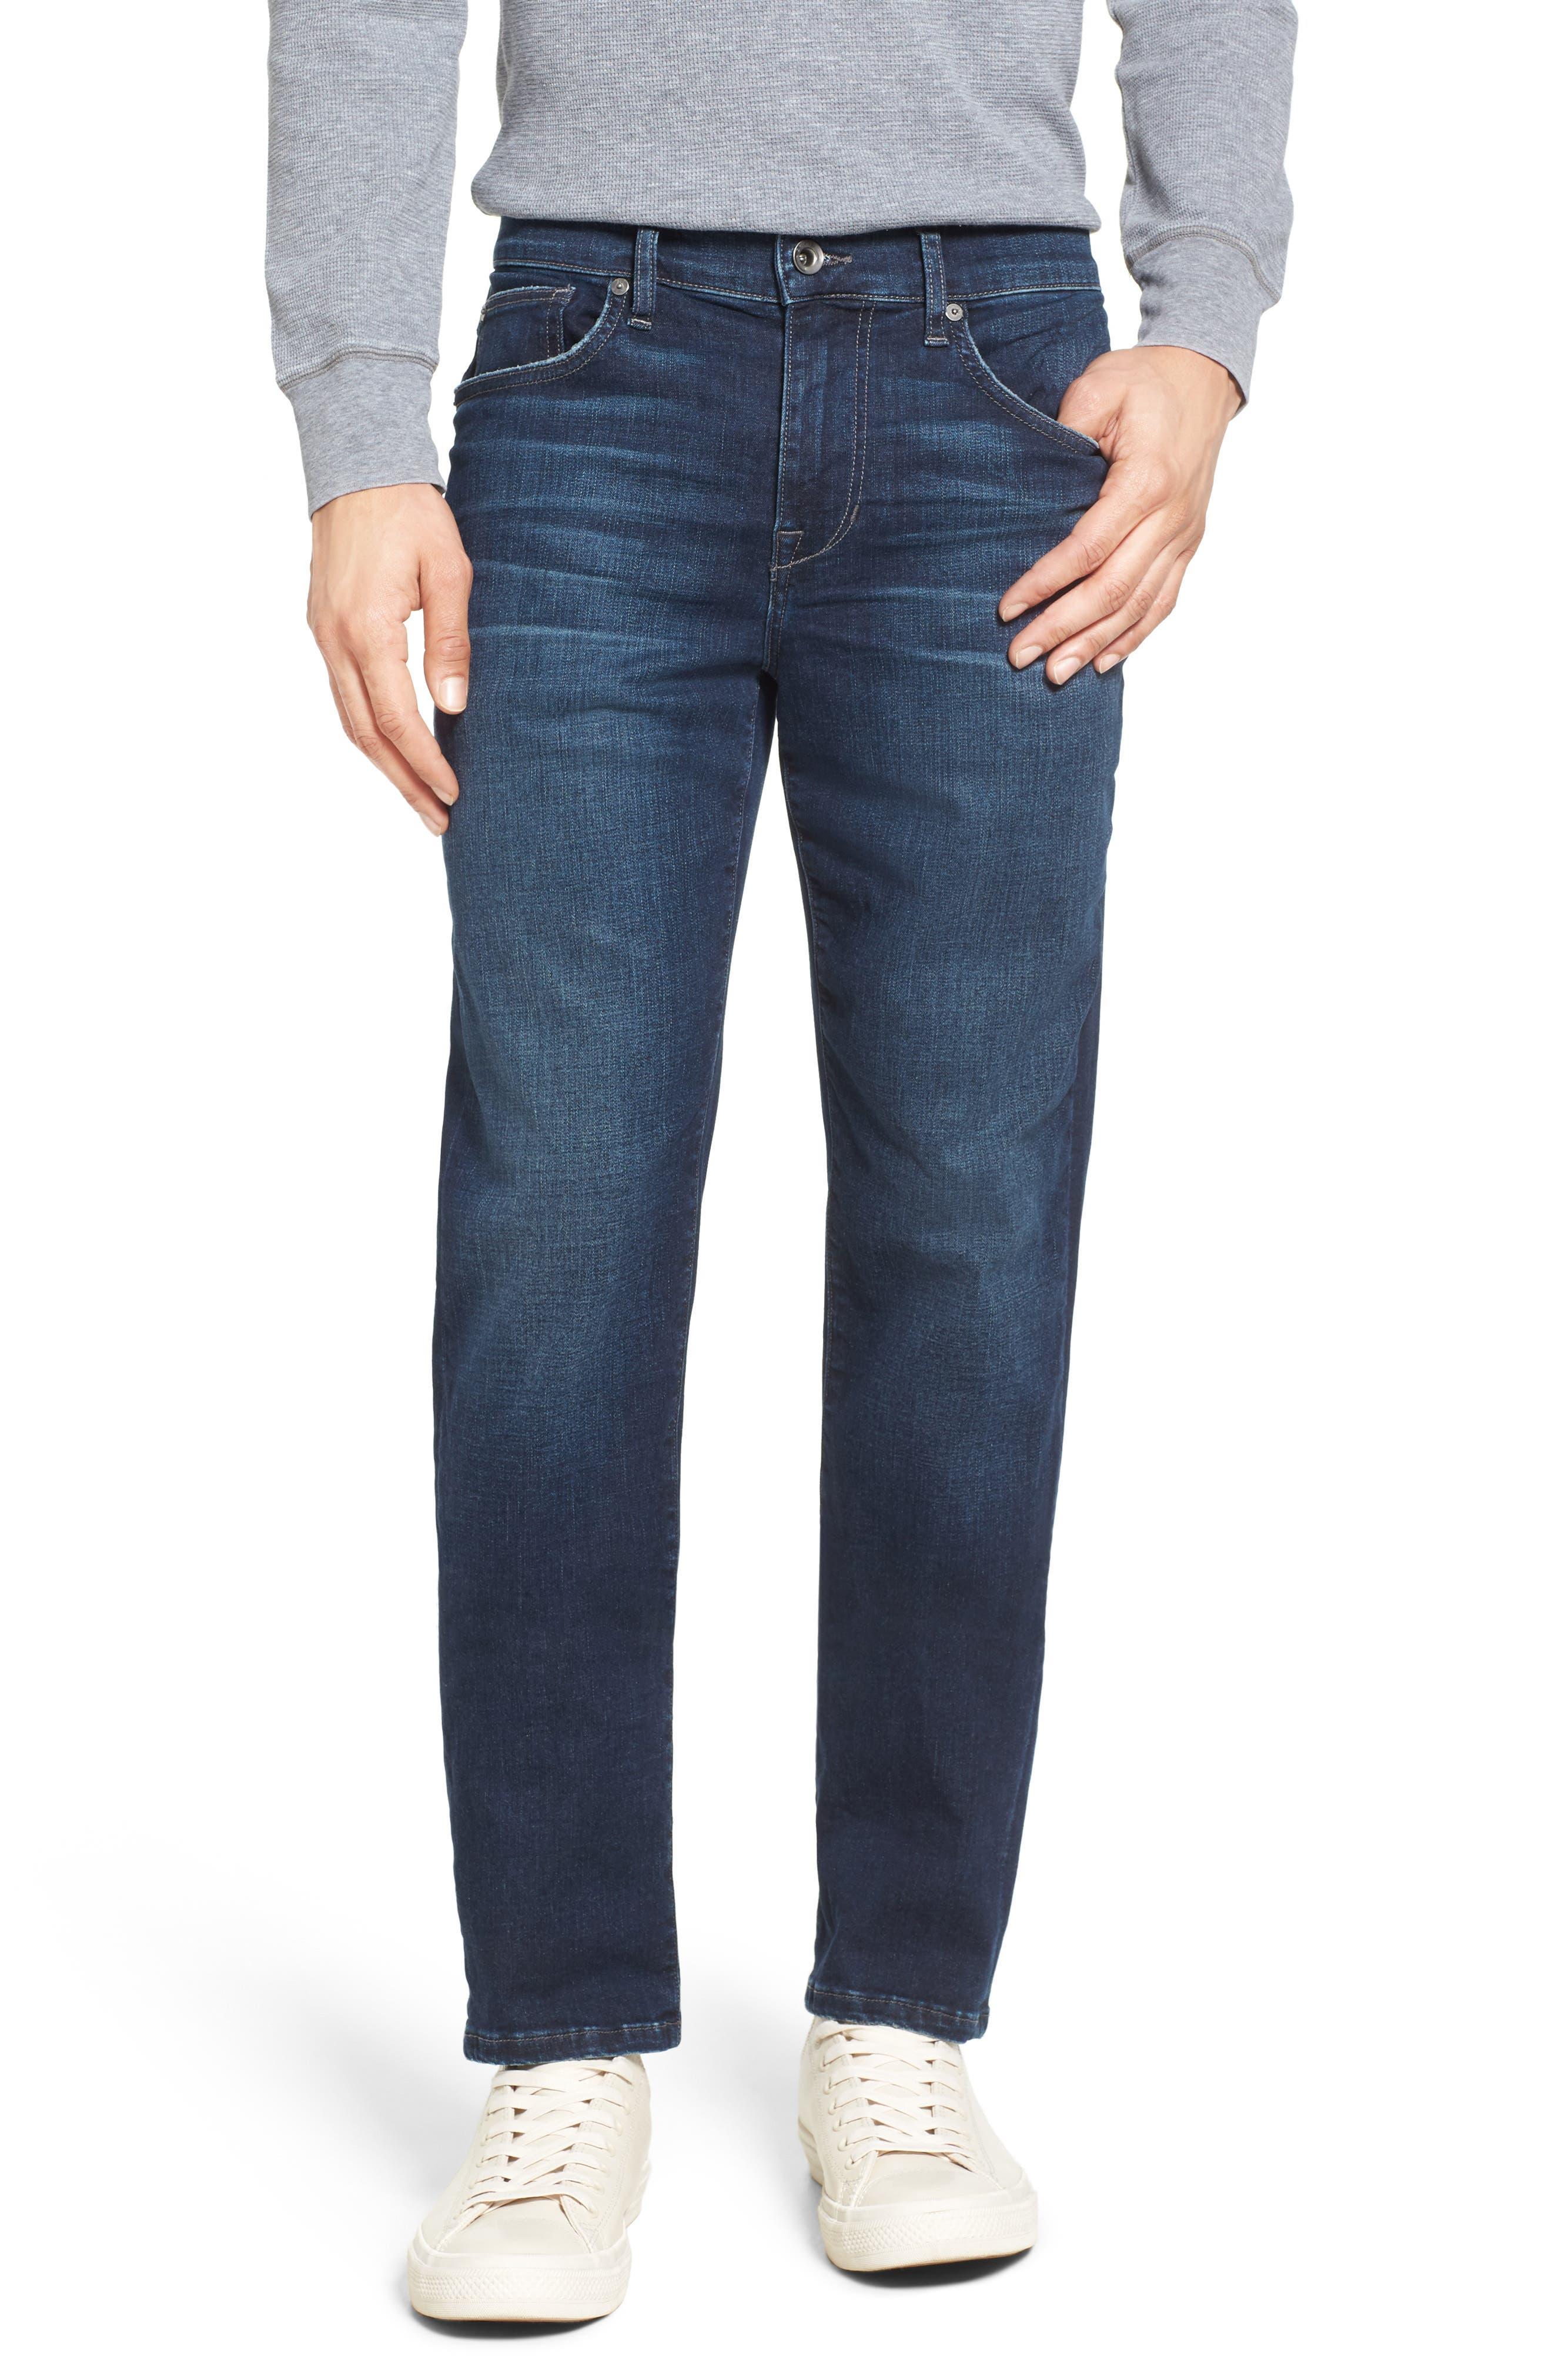 Kinetic Slim Fit Jeans,                             Main thumbnail 1, color,                             Aedan